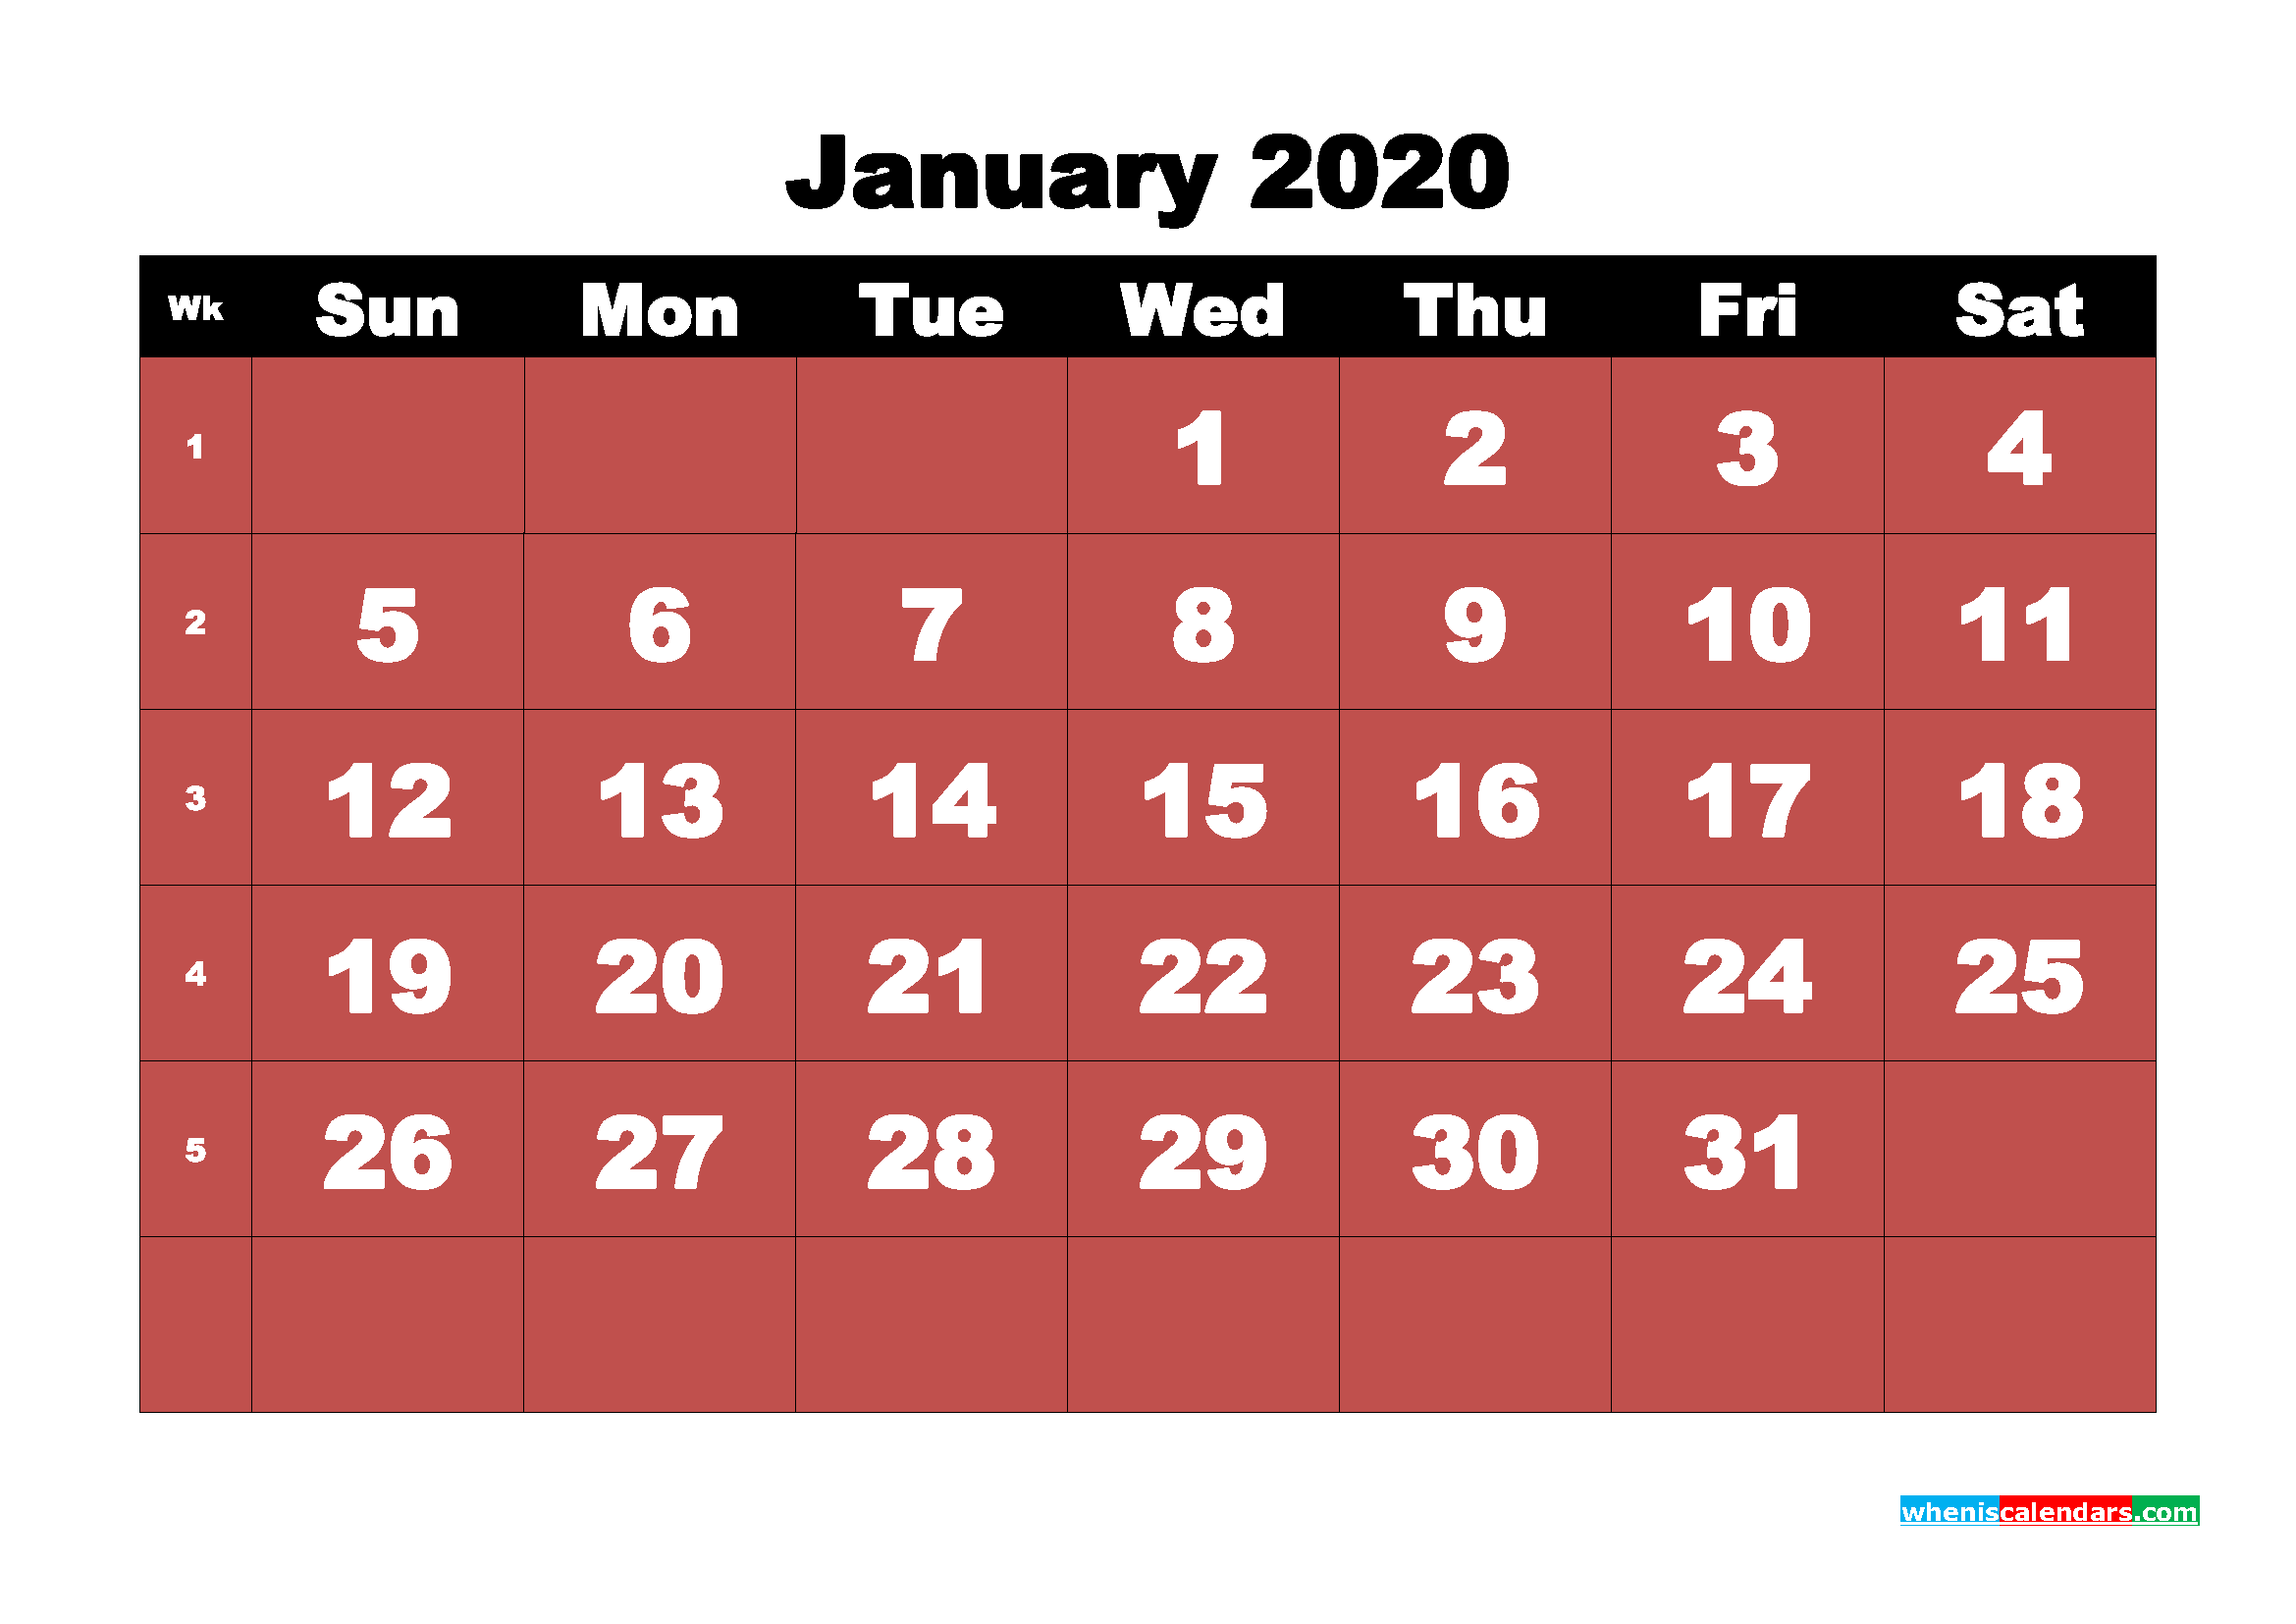 January Printable Calendar 2020 PDF, Word - No.m20b13